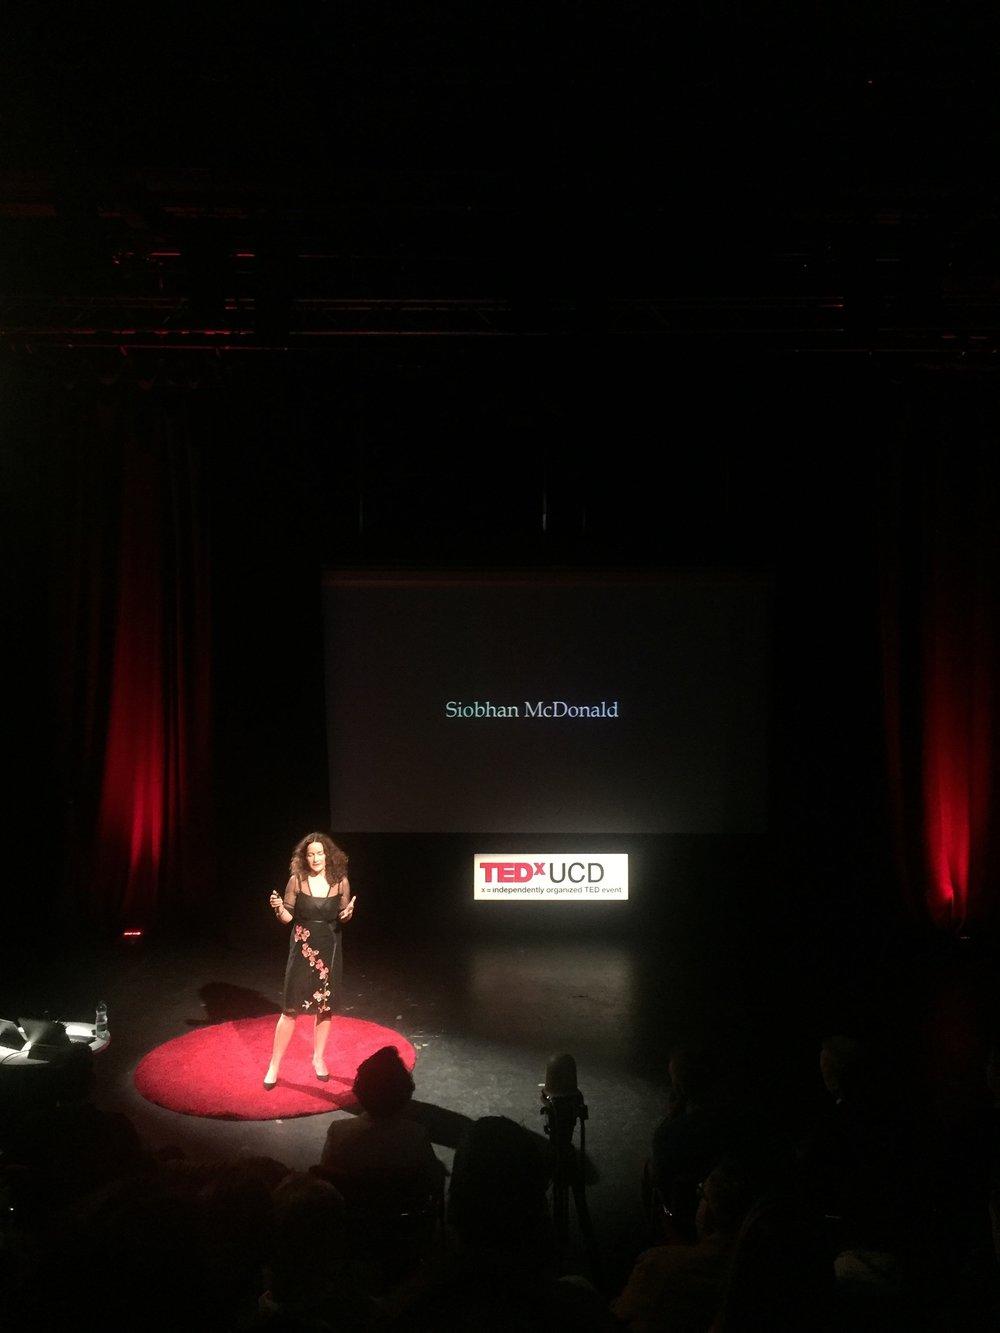 http://www.ucd.ie/innovation/newsevents/tedxucd/2017/speakers/siobhanmcdonnald/